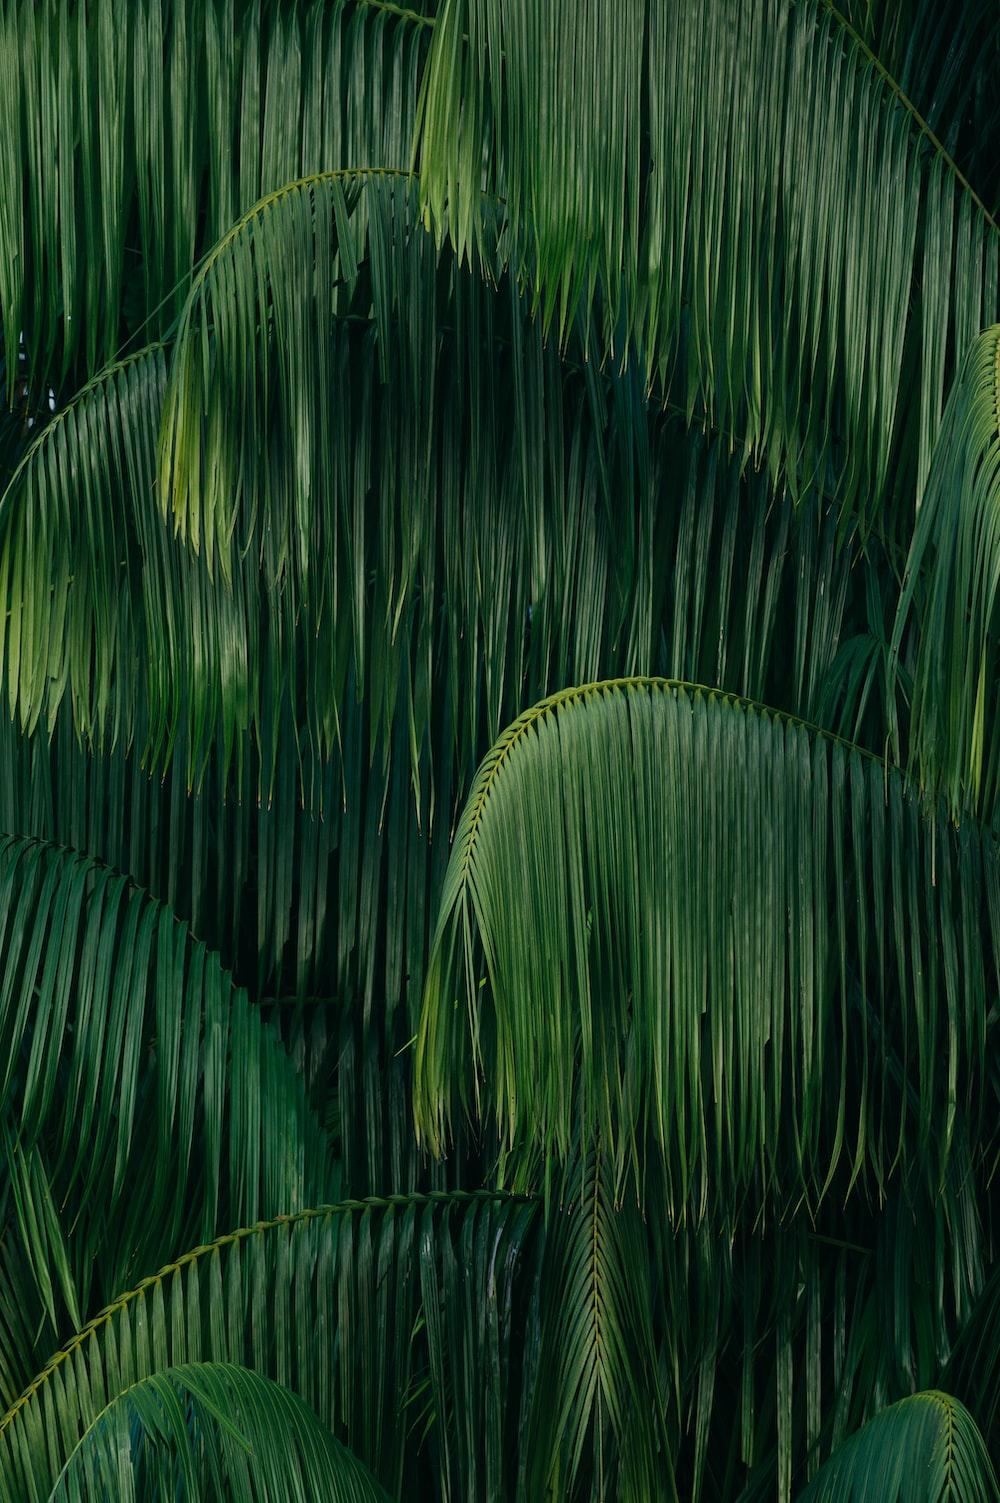 green coconut trees